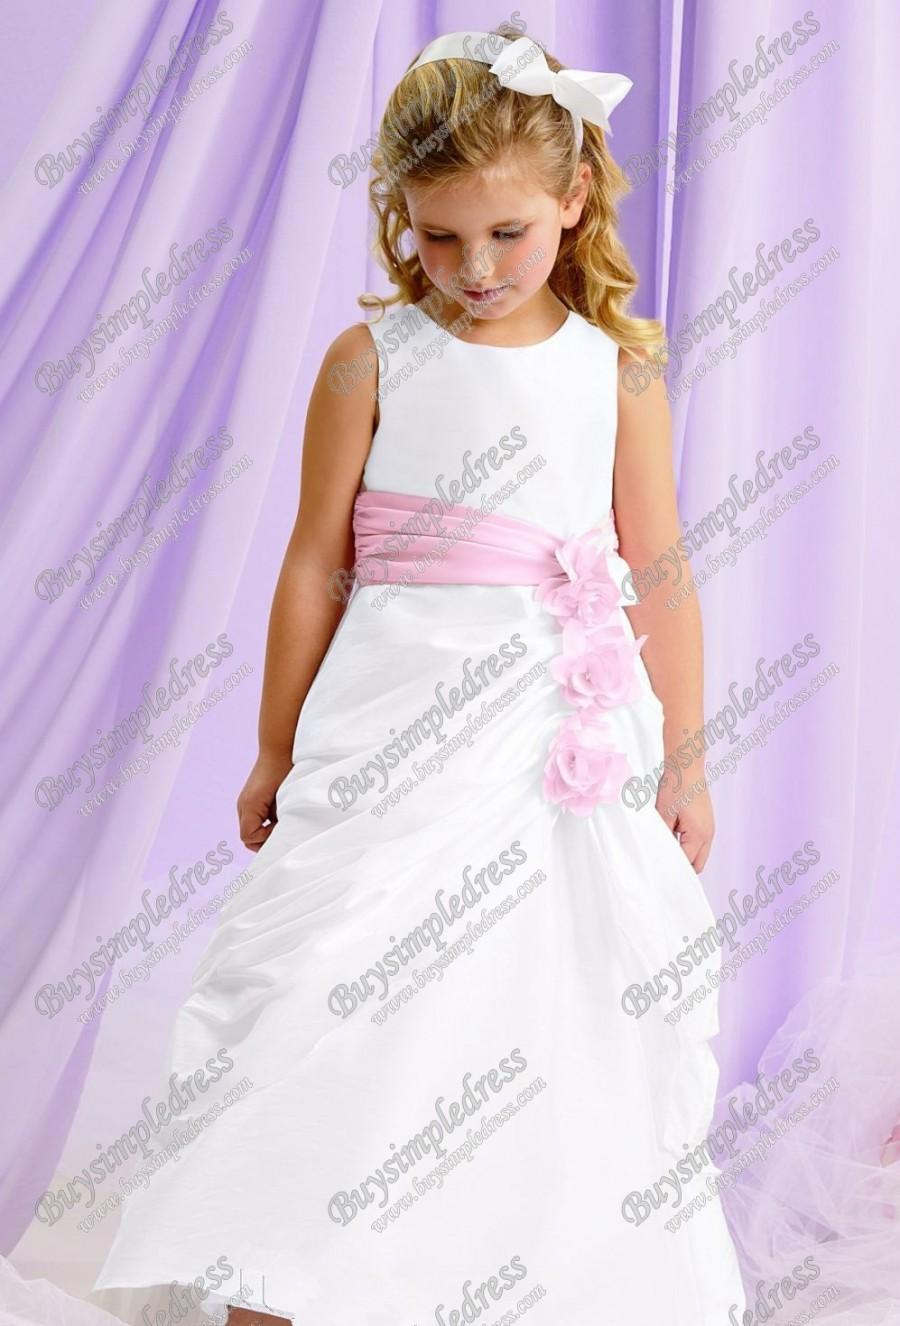 Wedding - Taffeta Flower Dress By Jordan Sweet Beginnings Collection L121